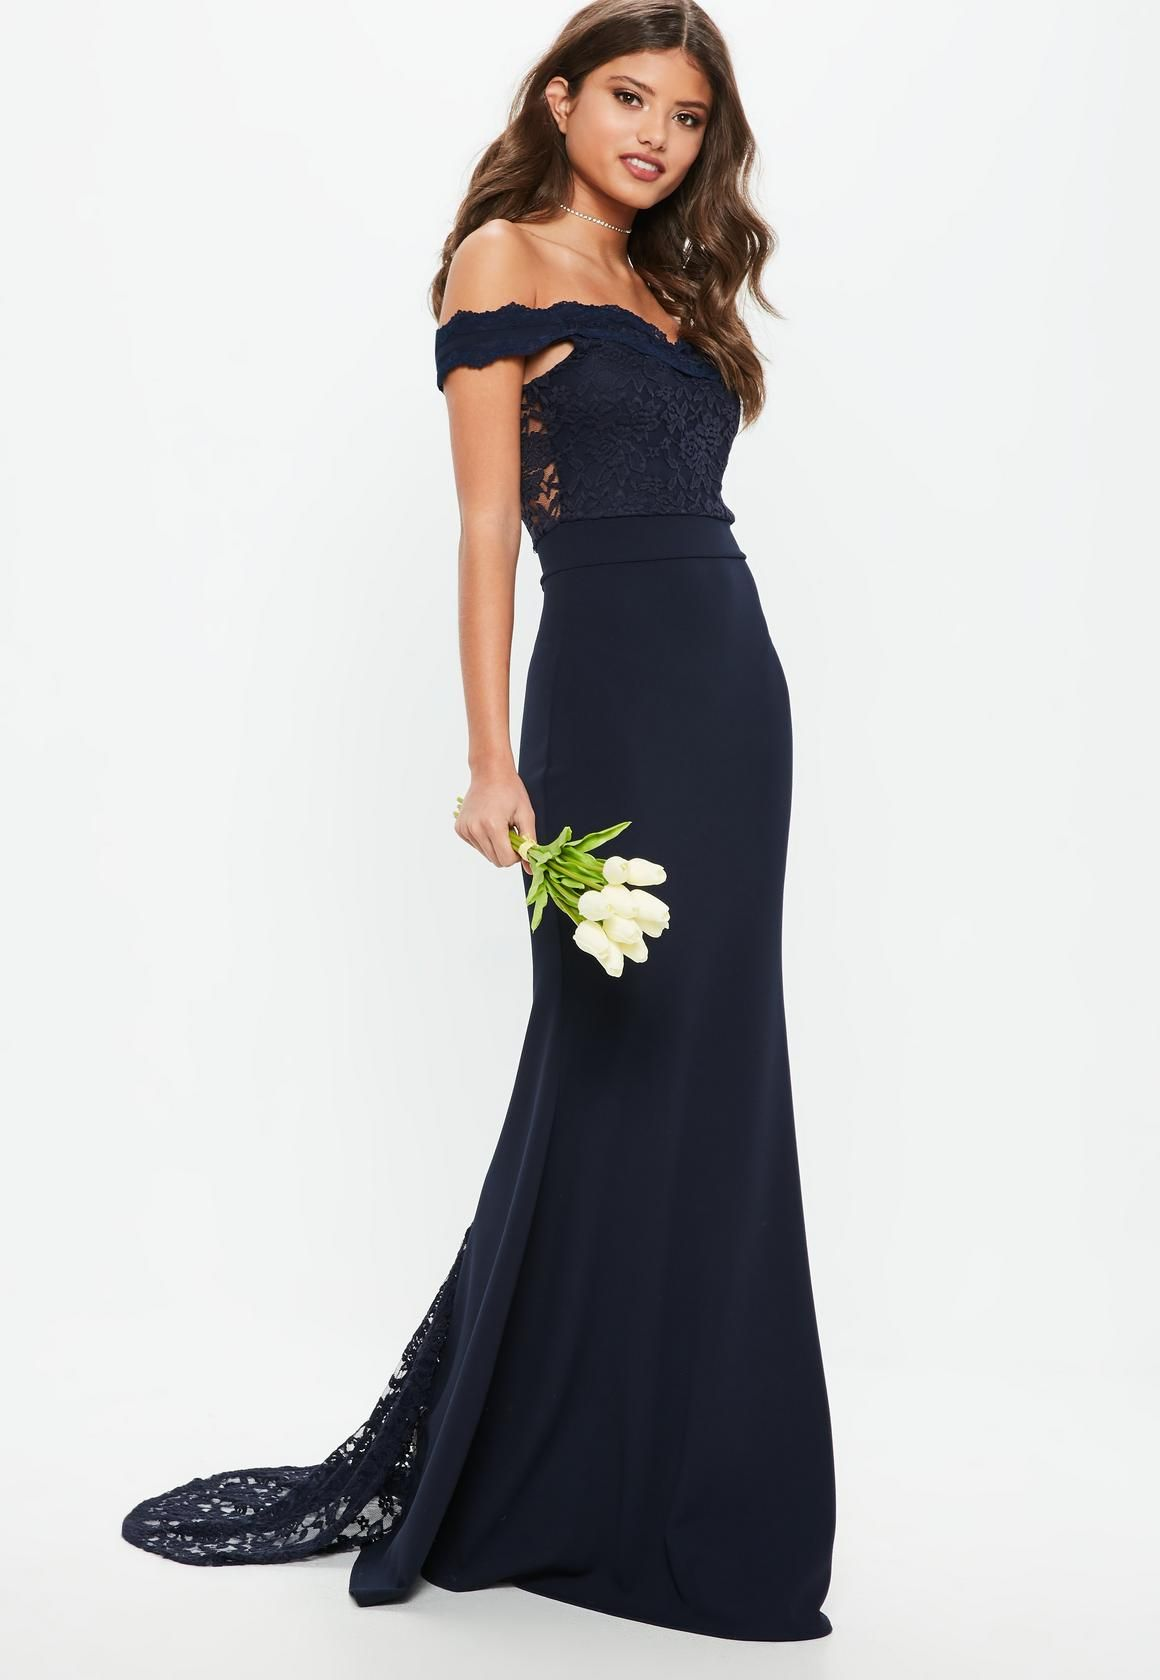 e4ad97d92a6 Missguided Bridesmaid Navy Bardot Lace Insert Fishtail Maxi Dress ...